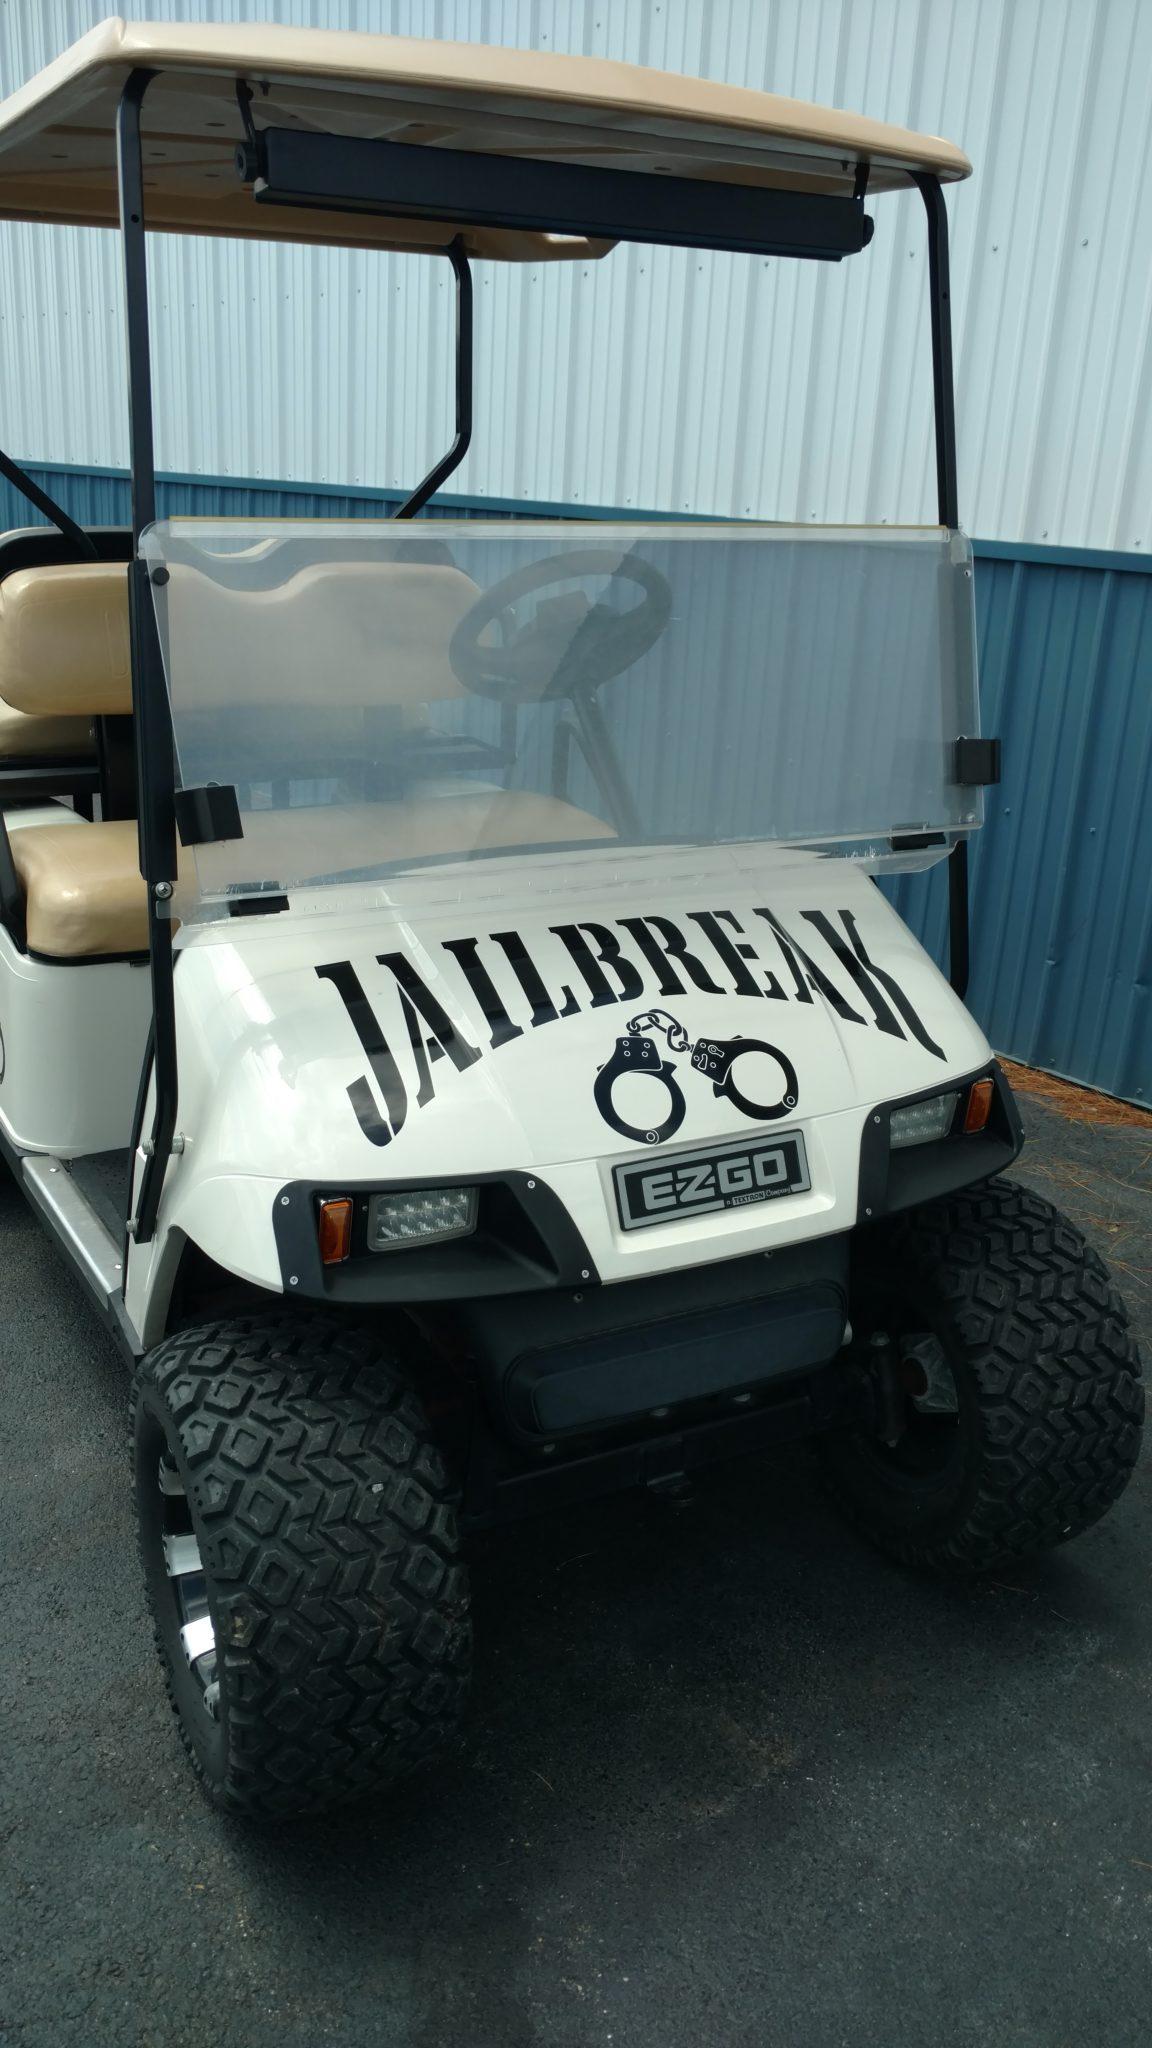 Jailbreak 2 - Indian River Golf Cars